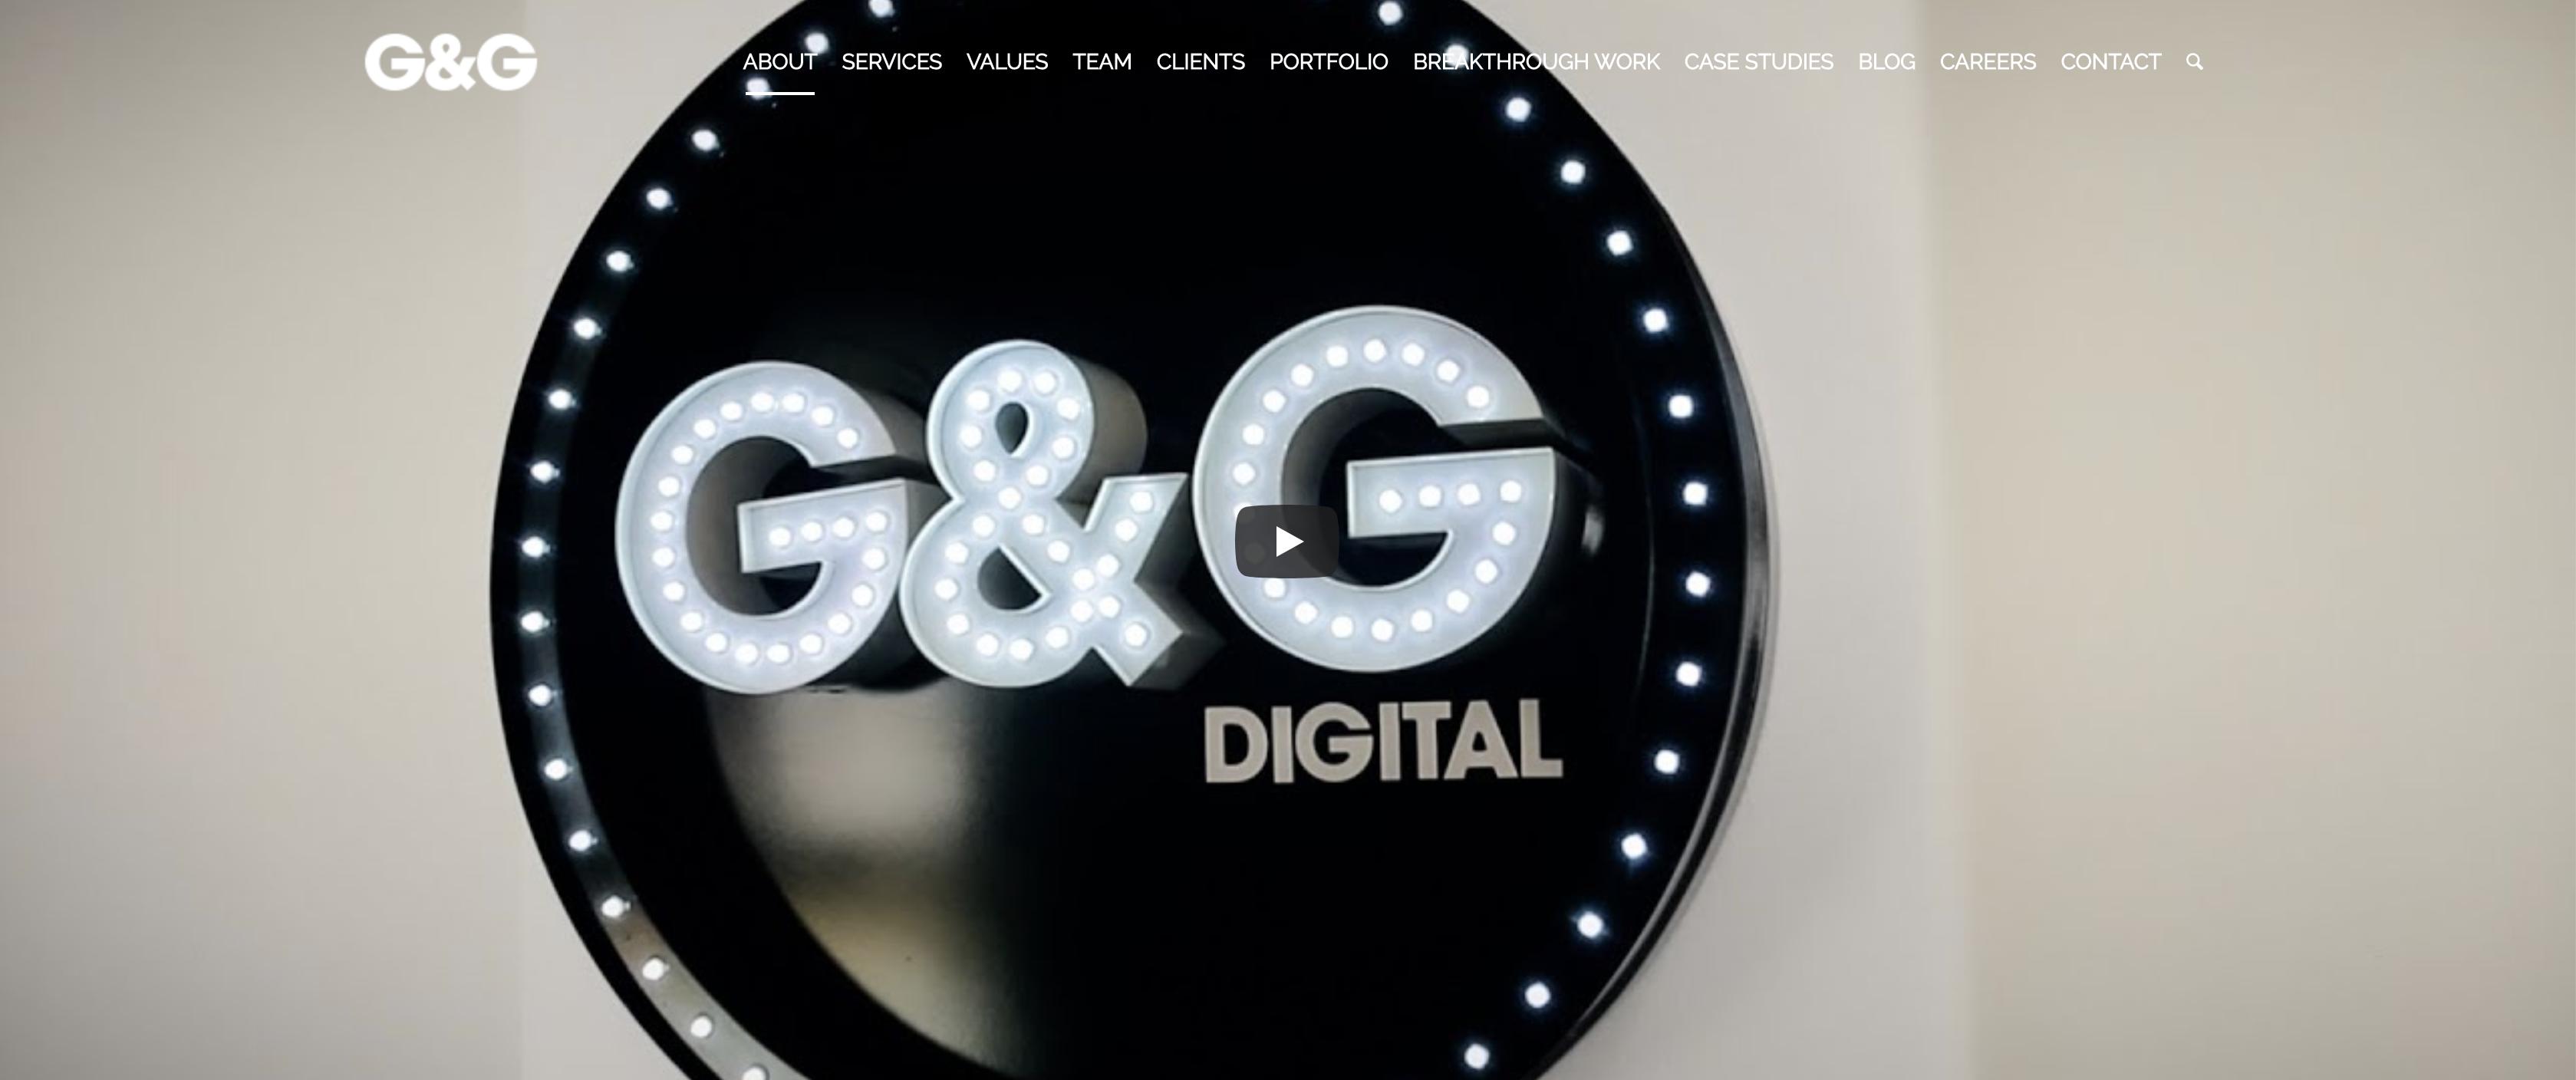 G&G Digital